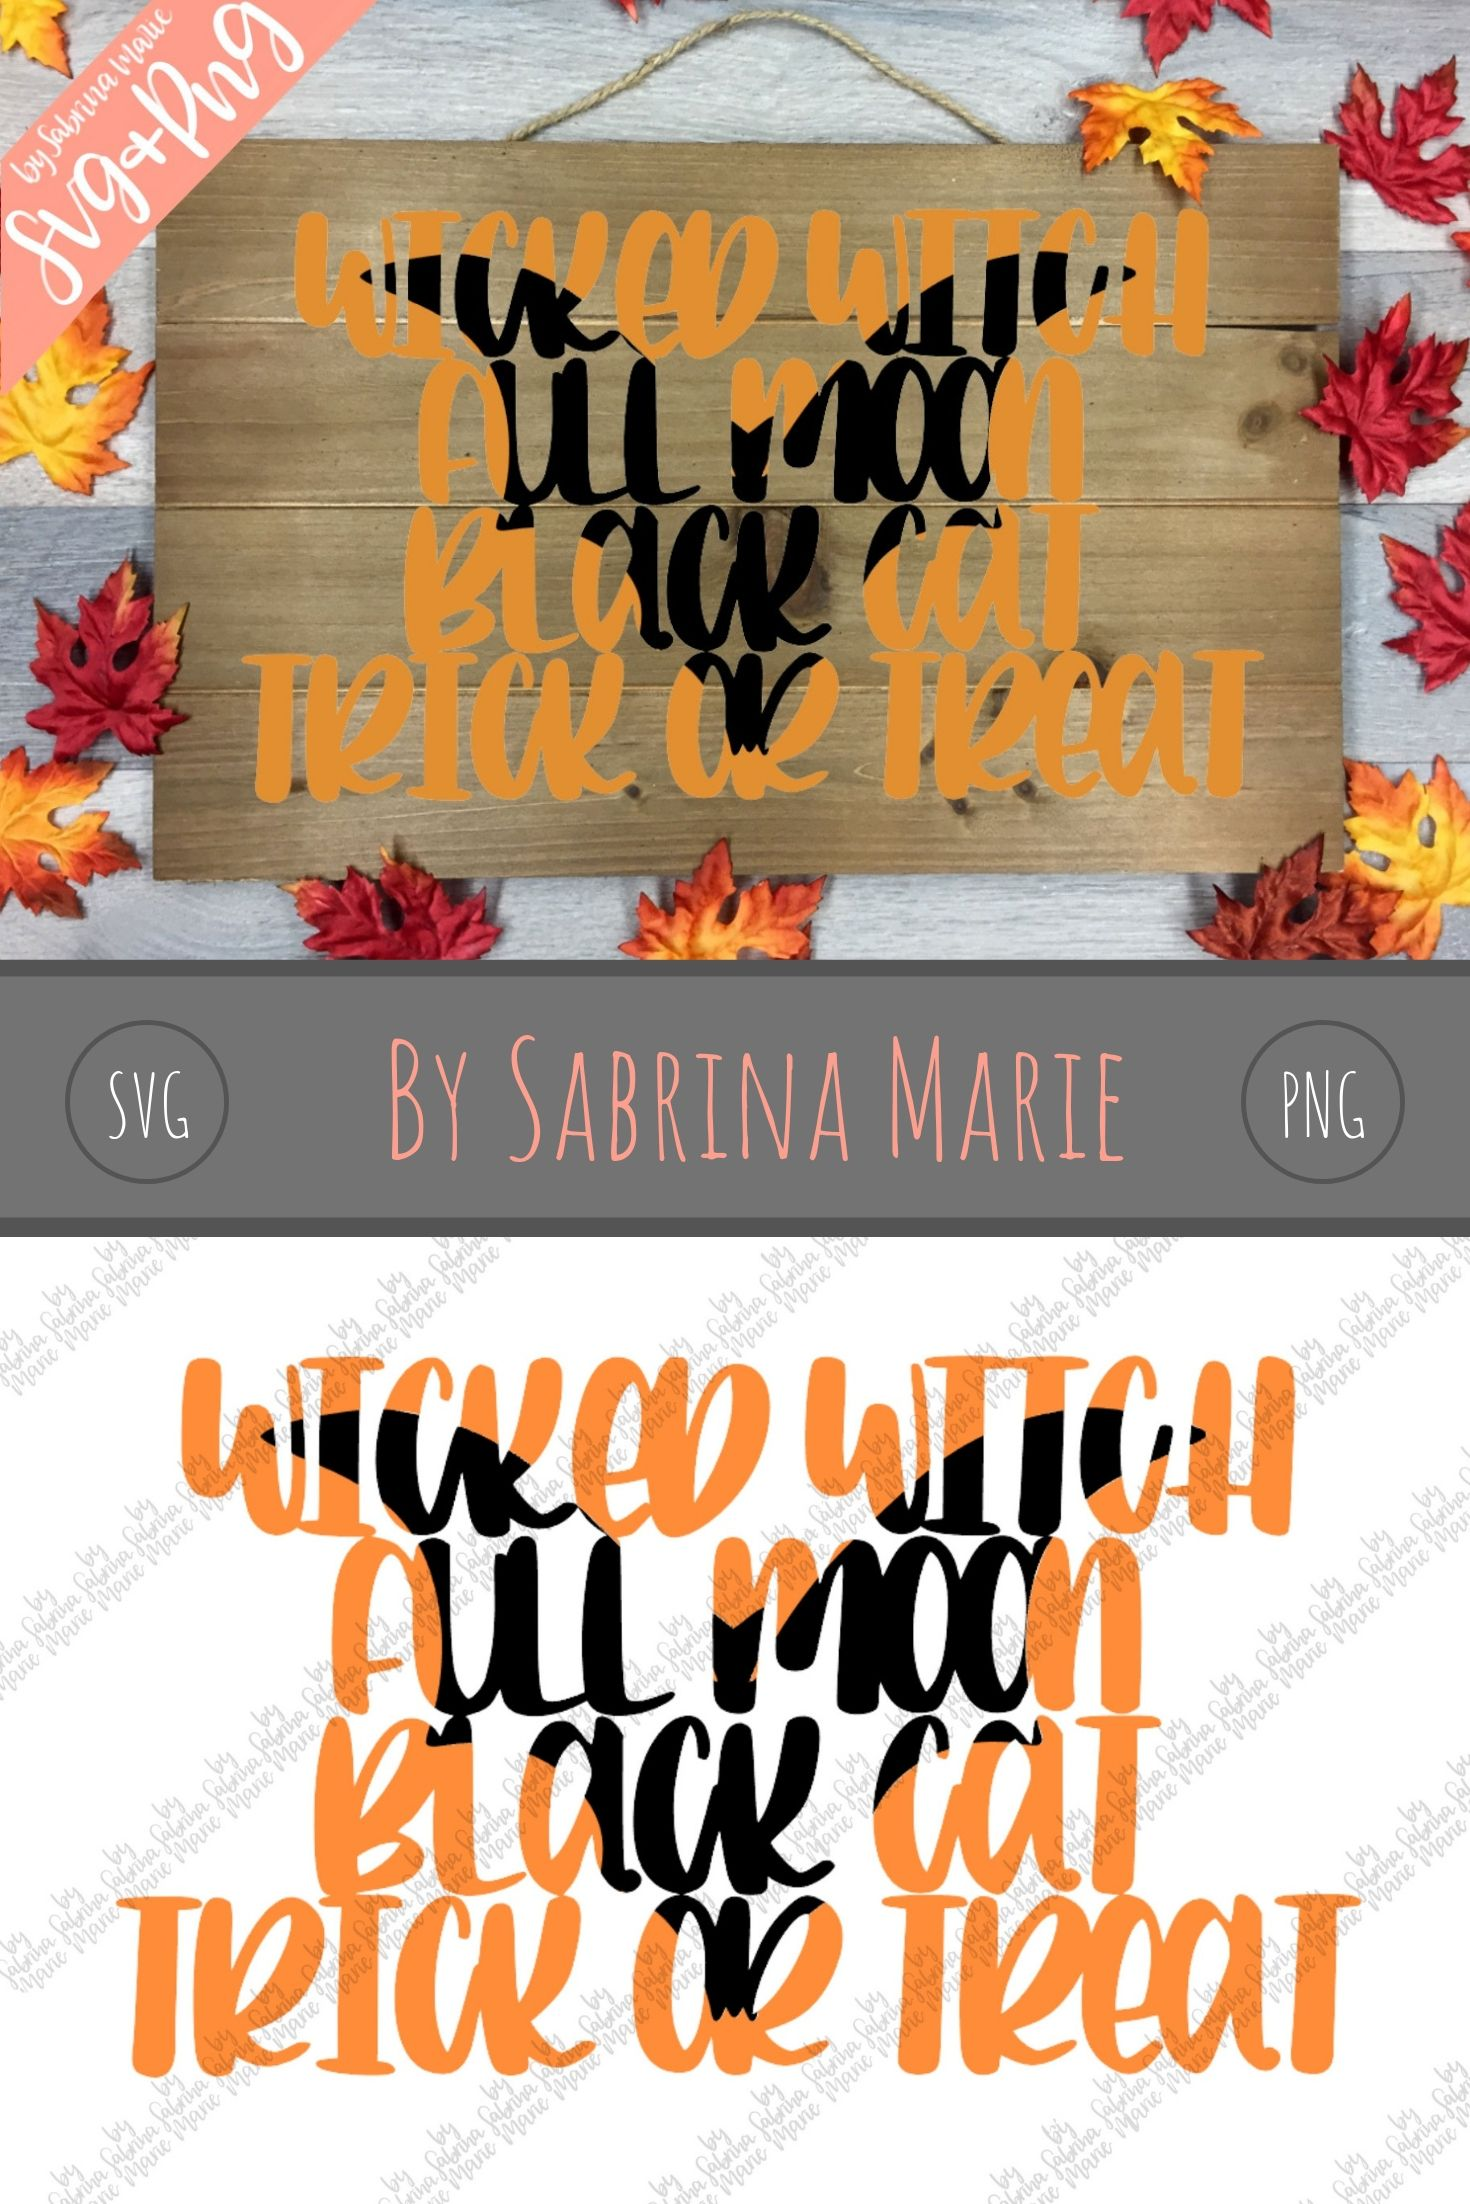 Handlettered Halloween Knockout Design with Bat - SVG/PNG example image 3